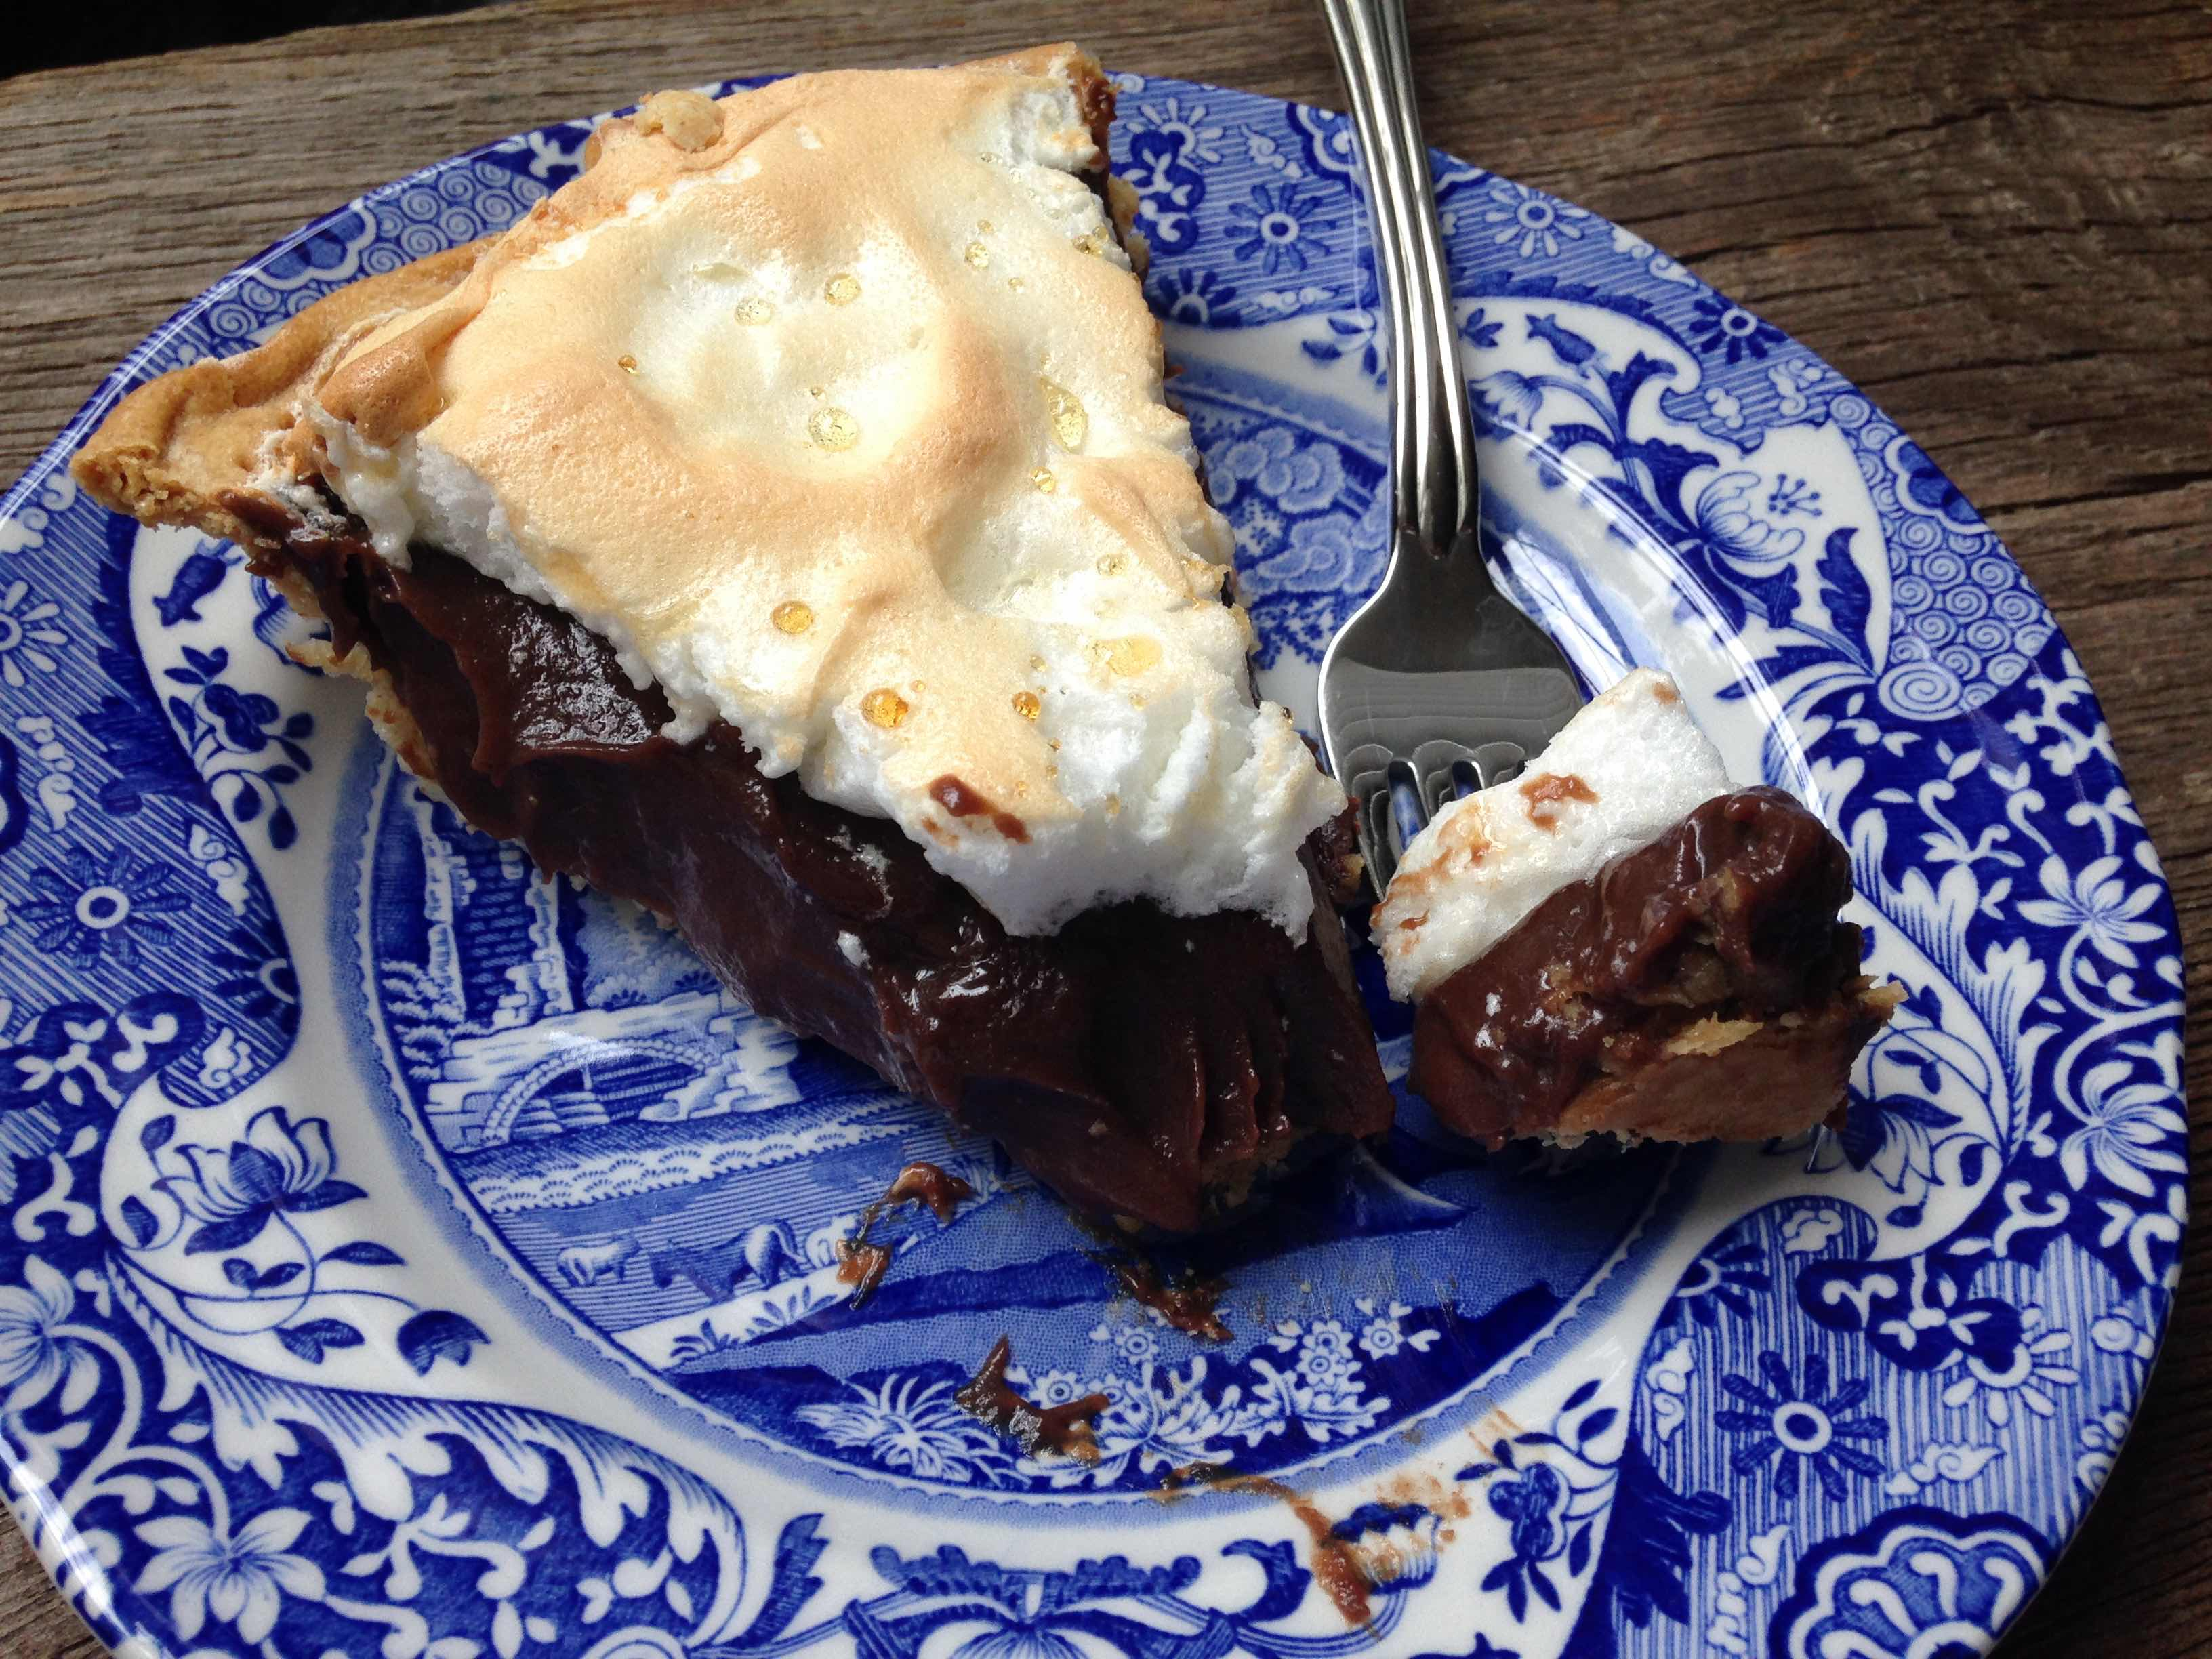 Mallory's Chocolate Meringue Pie – Dallas Duo Bakes